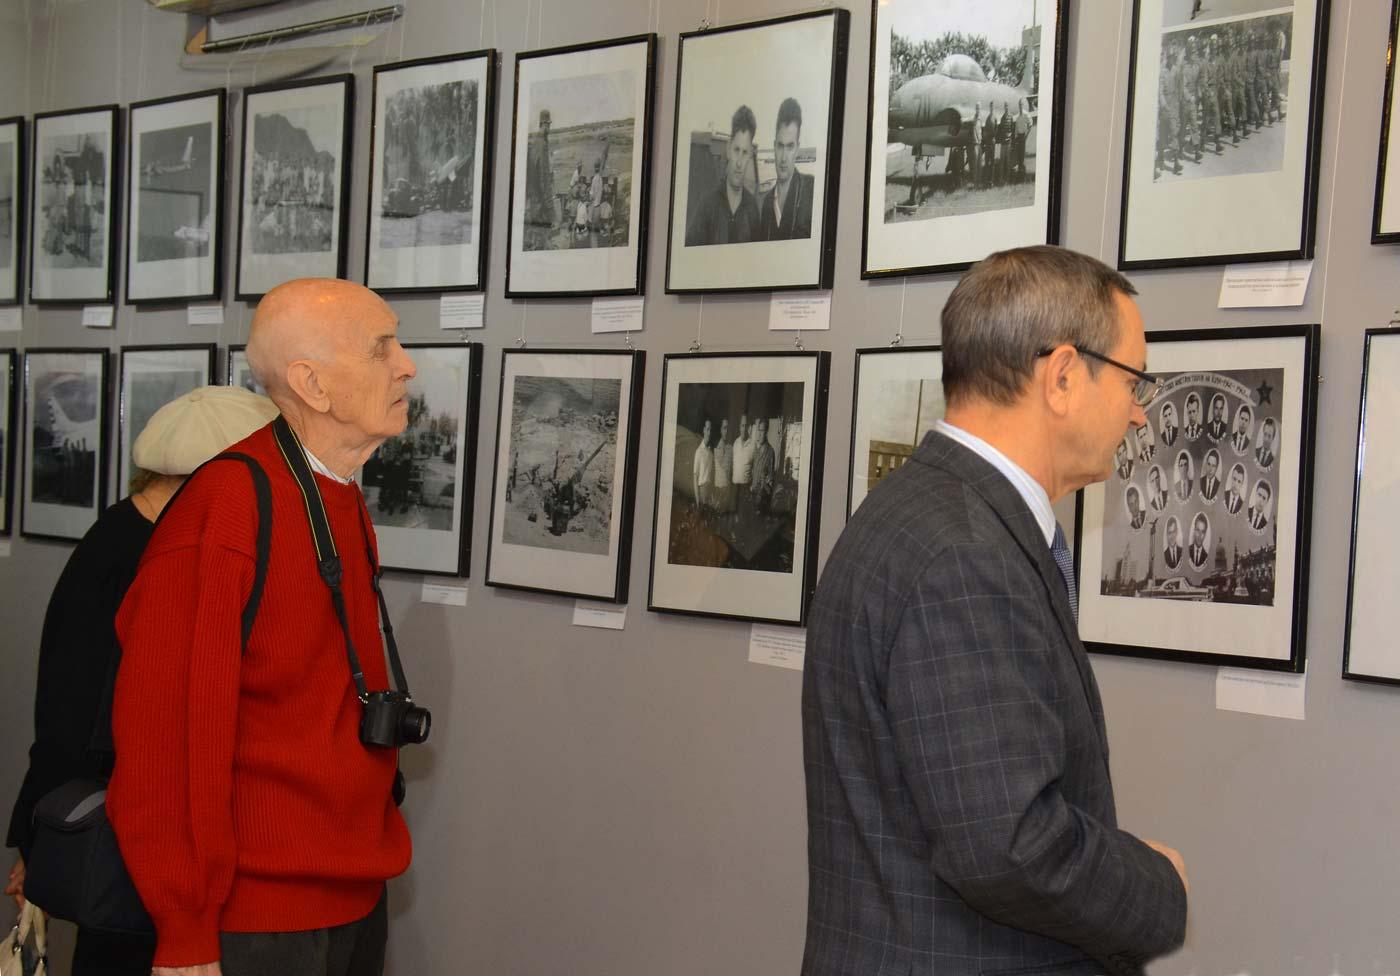 2016-10-27. Снимки от организаторов выставки. Фото 6